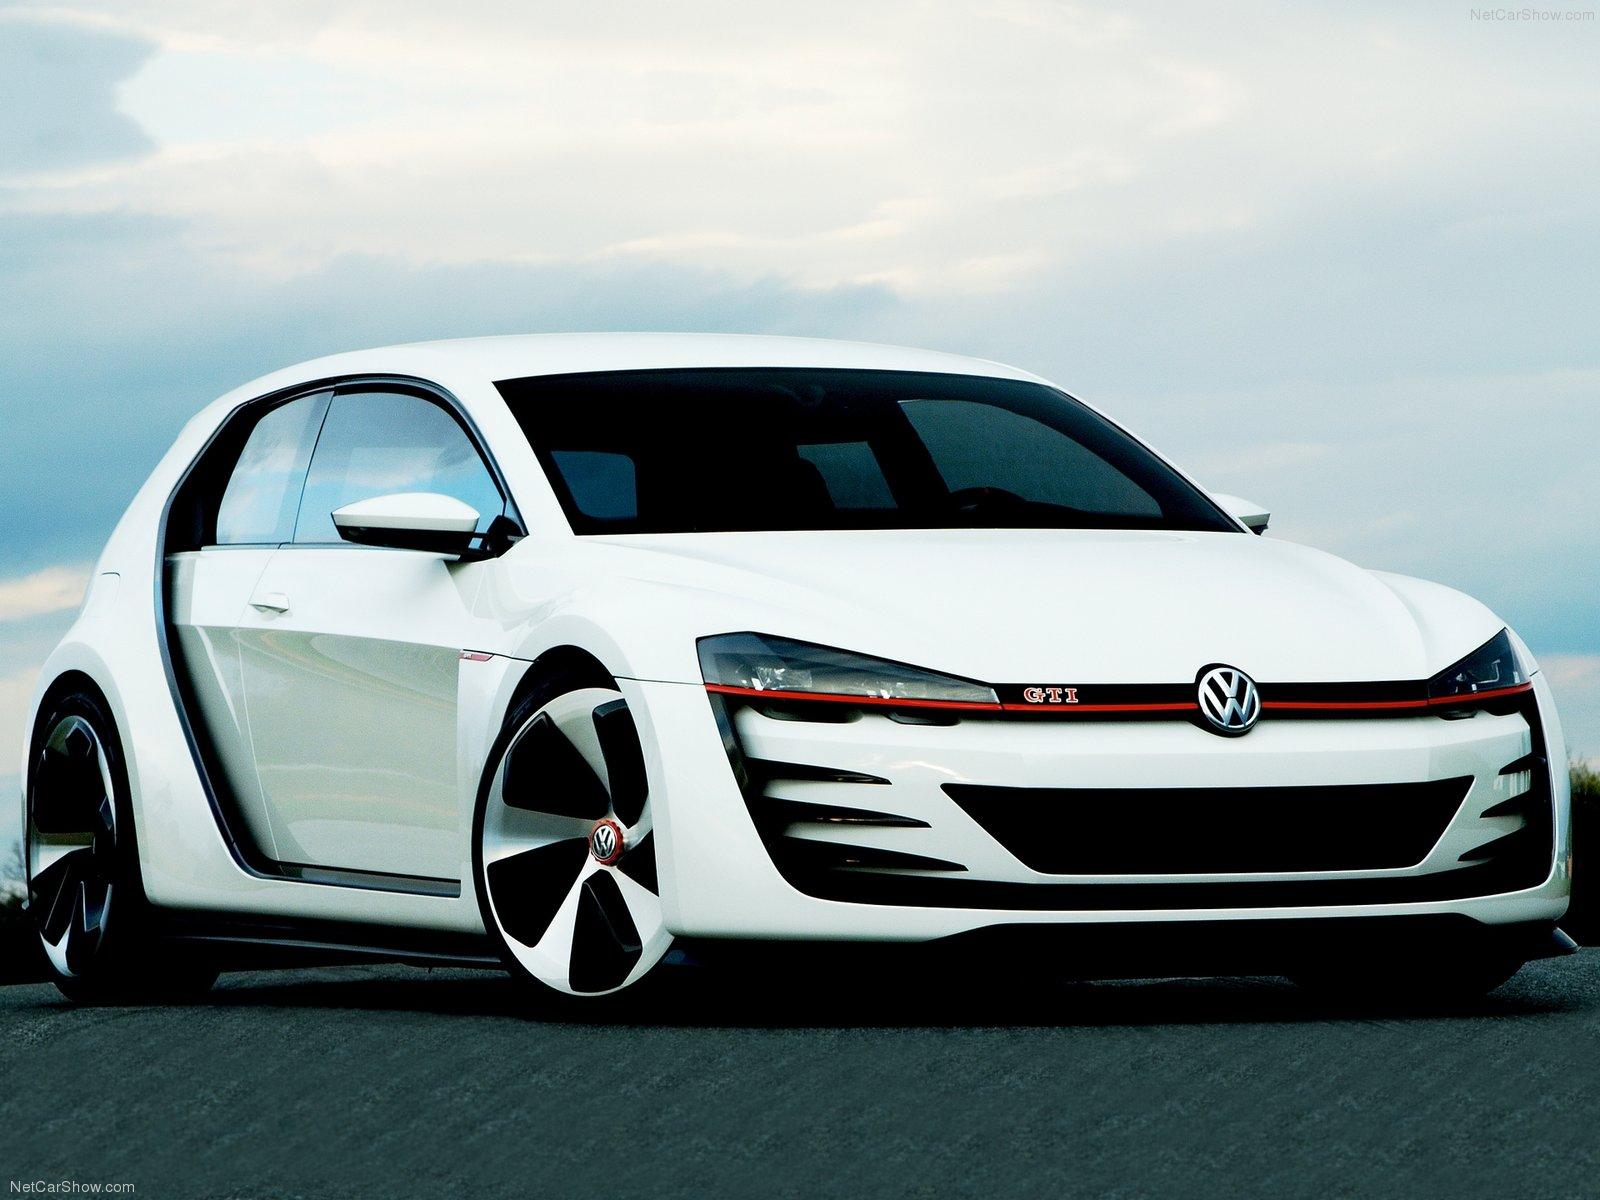 74] Volkswagen Gti Wallpaper on WallpaperSafari 1600x1200